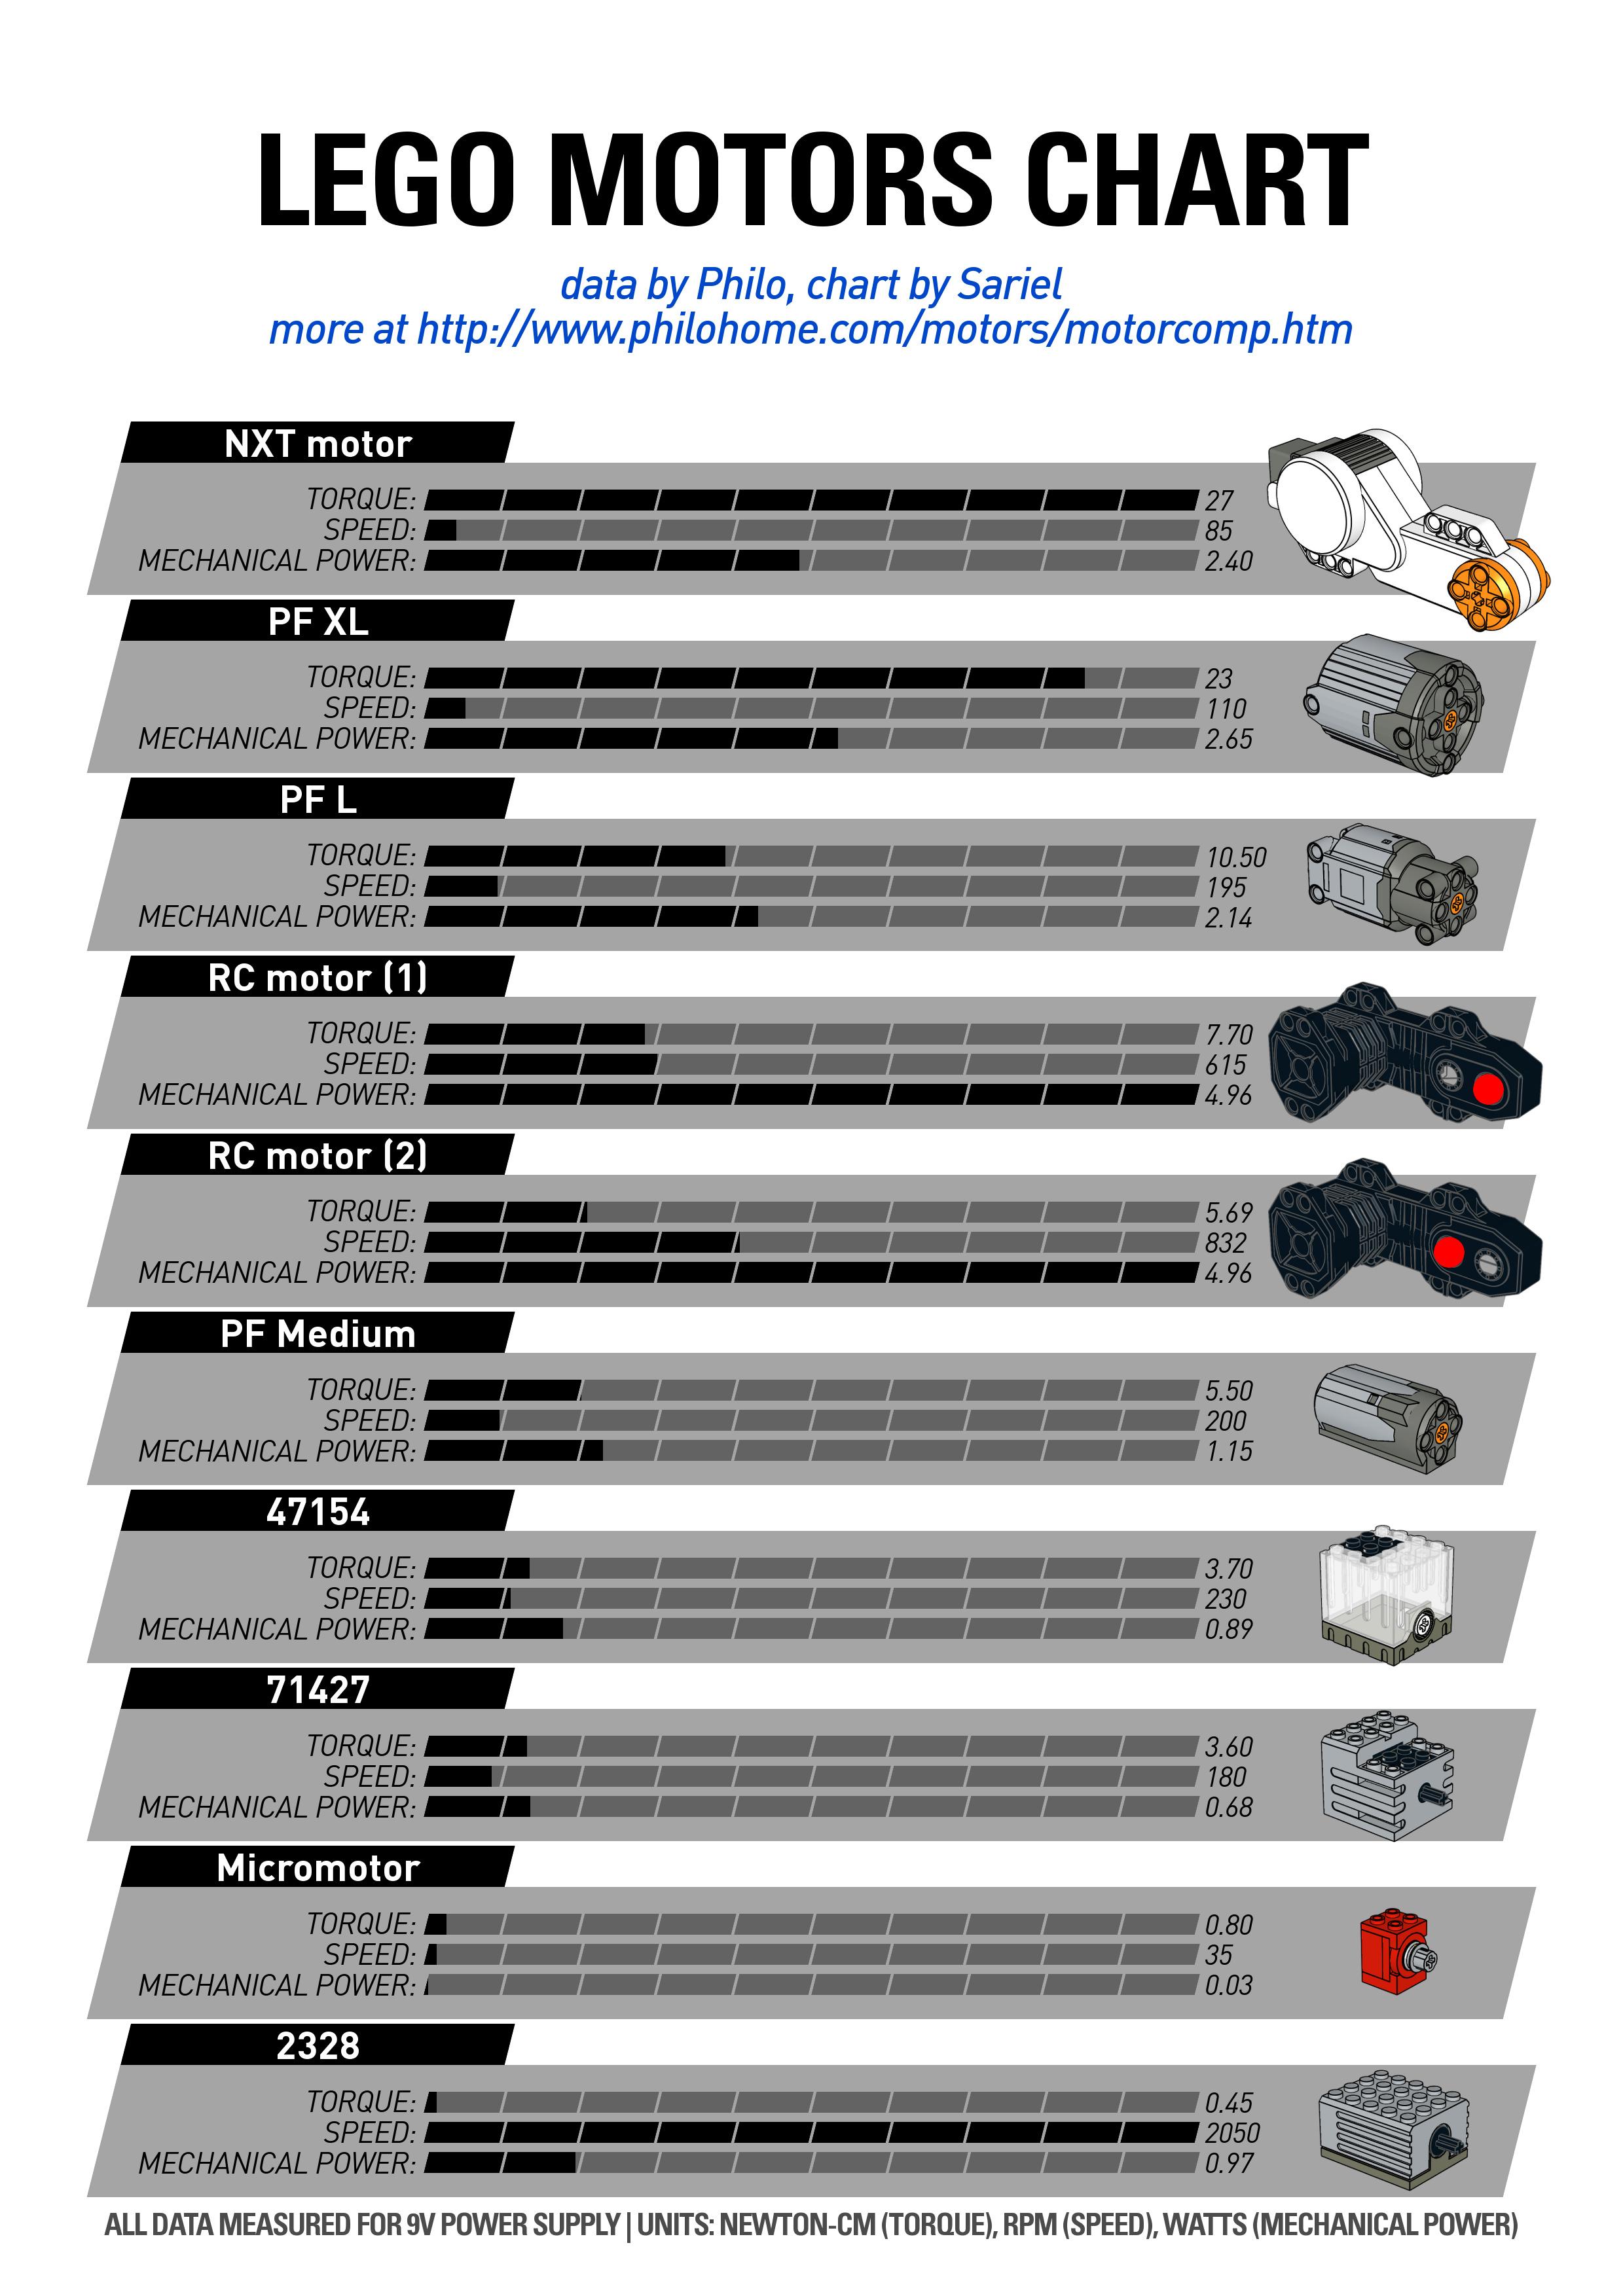 LEGO Motors Chart by Sariel & Philo